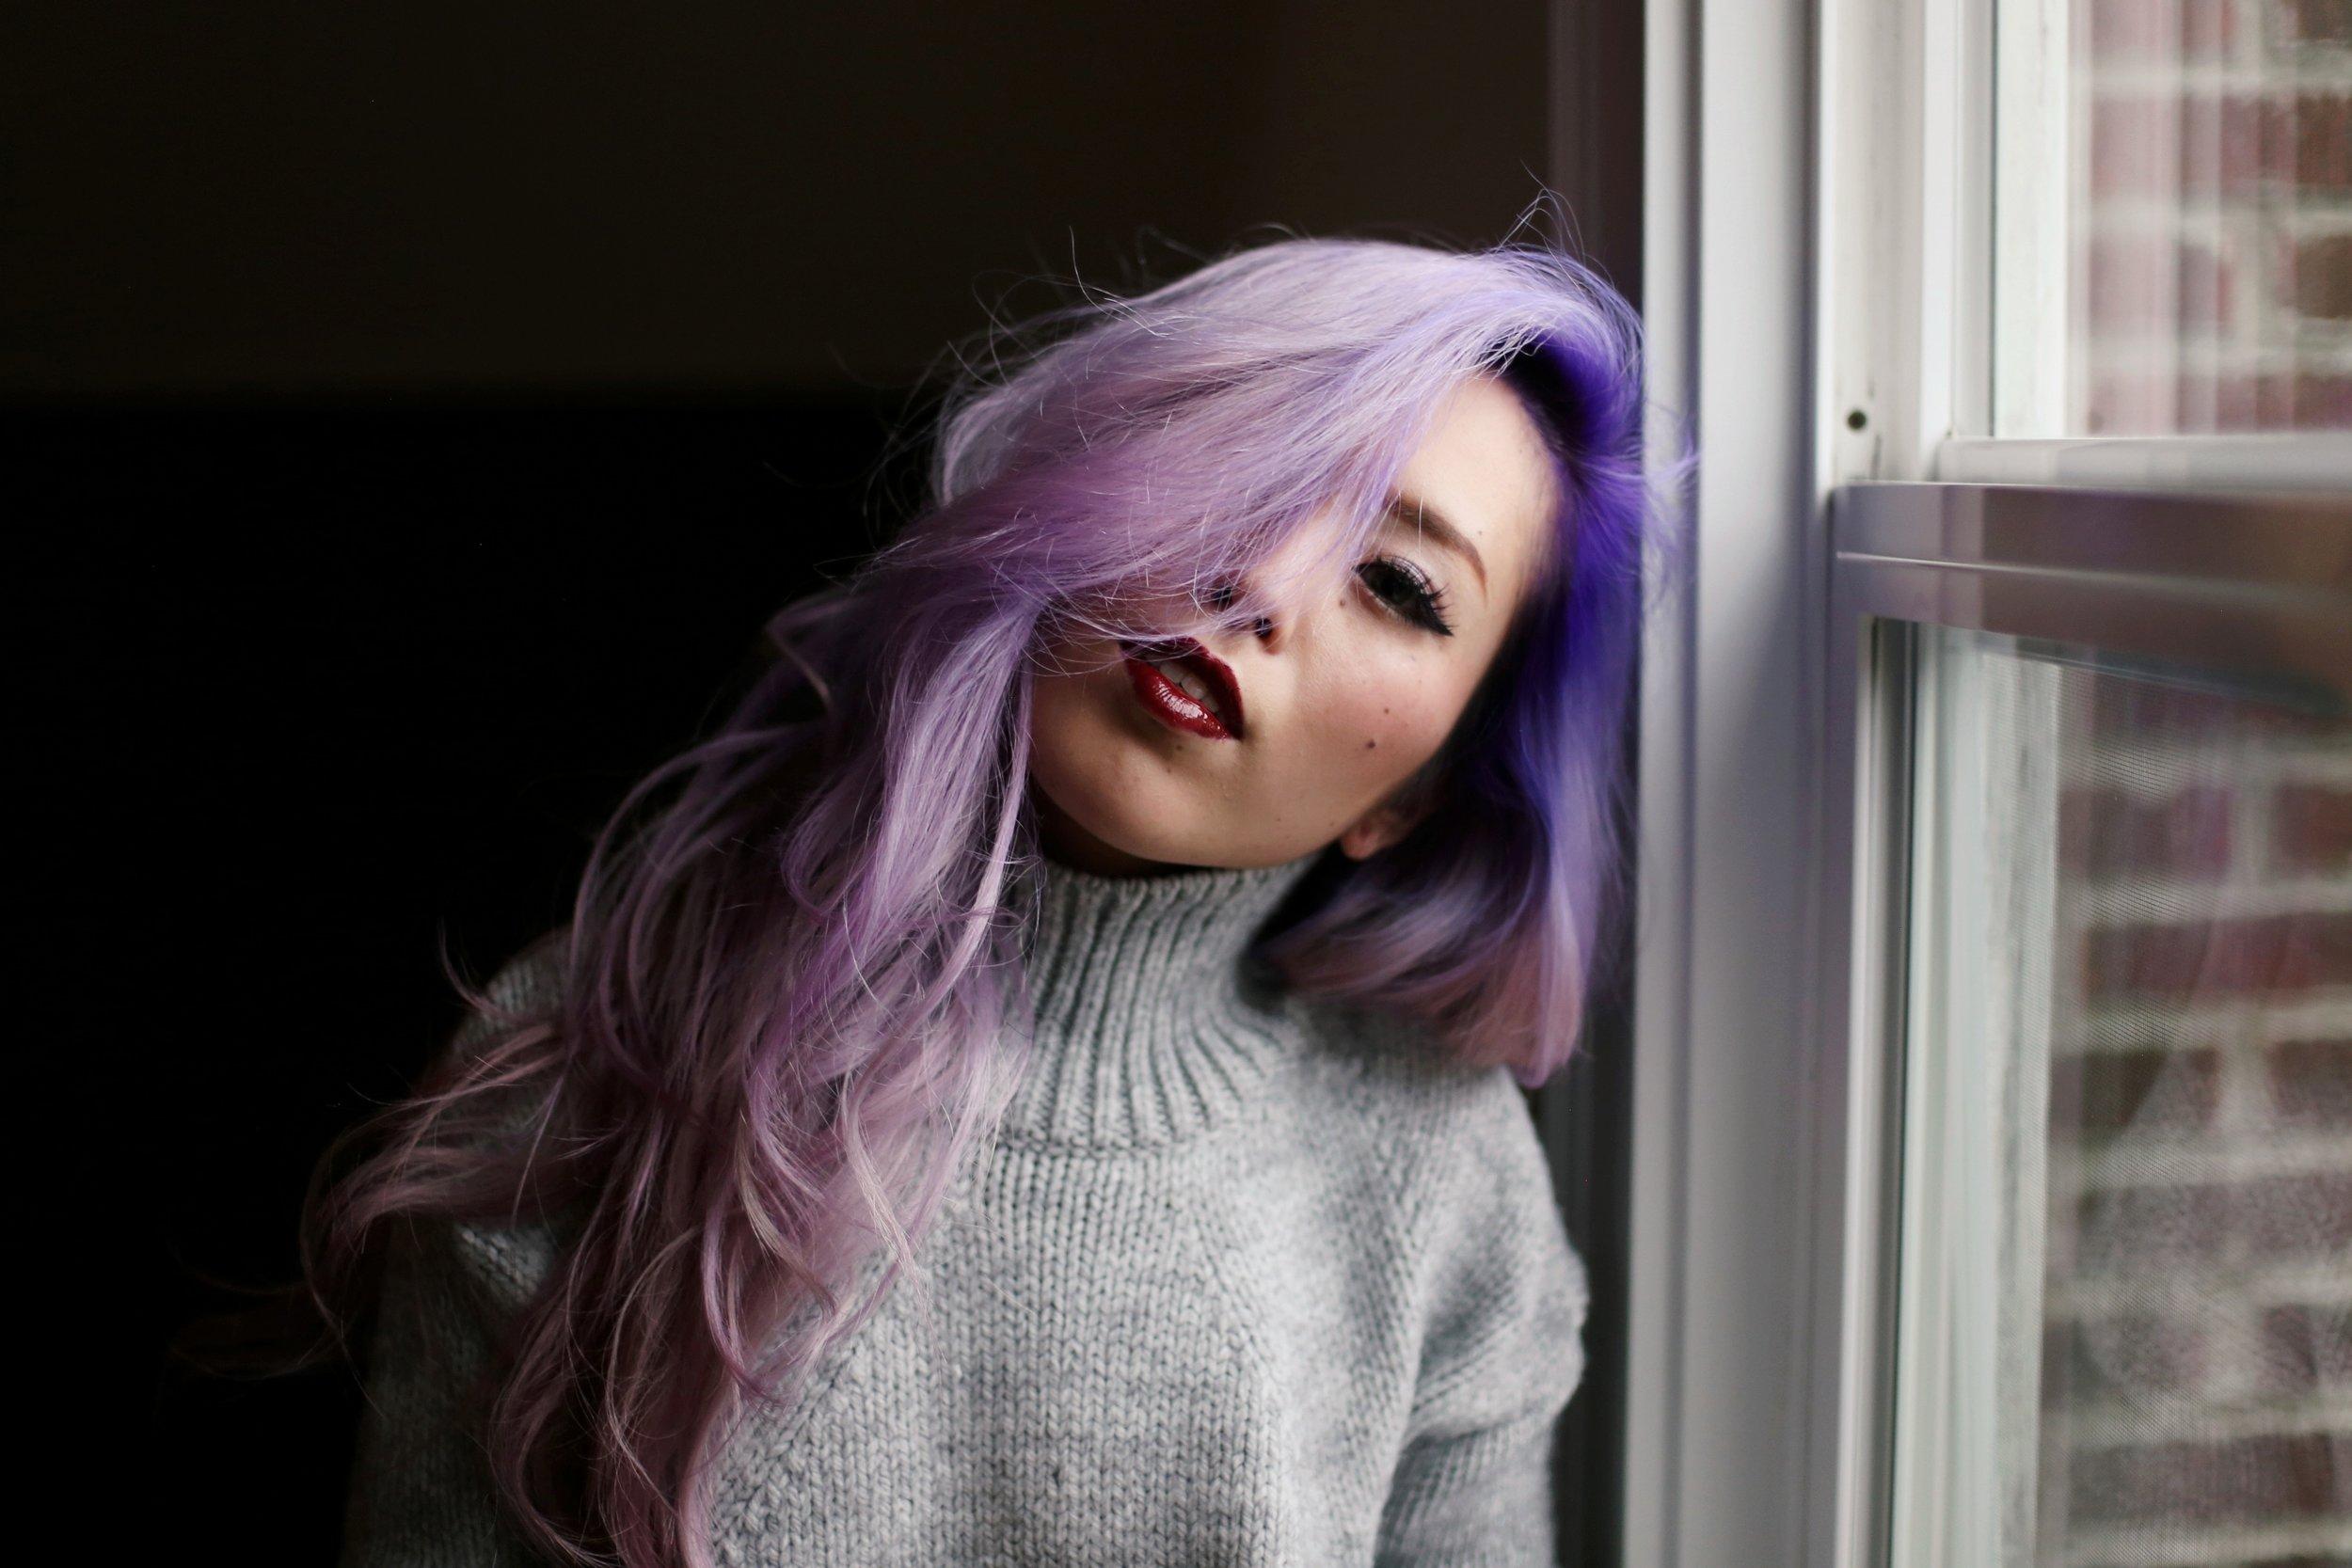 Boudoir Photo-black and white photography-sweater weather-turtle neck sweater-black lingerie-dark lipstick-japanese-Aika's Love Closet-Seattle model-Seattle Style blogger-Lavender Hair-colored Hair-Mermaid Hair-Zara Sweater 13